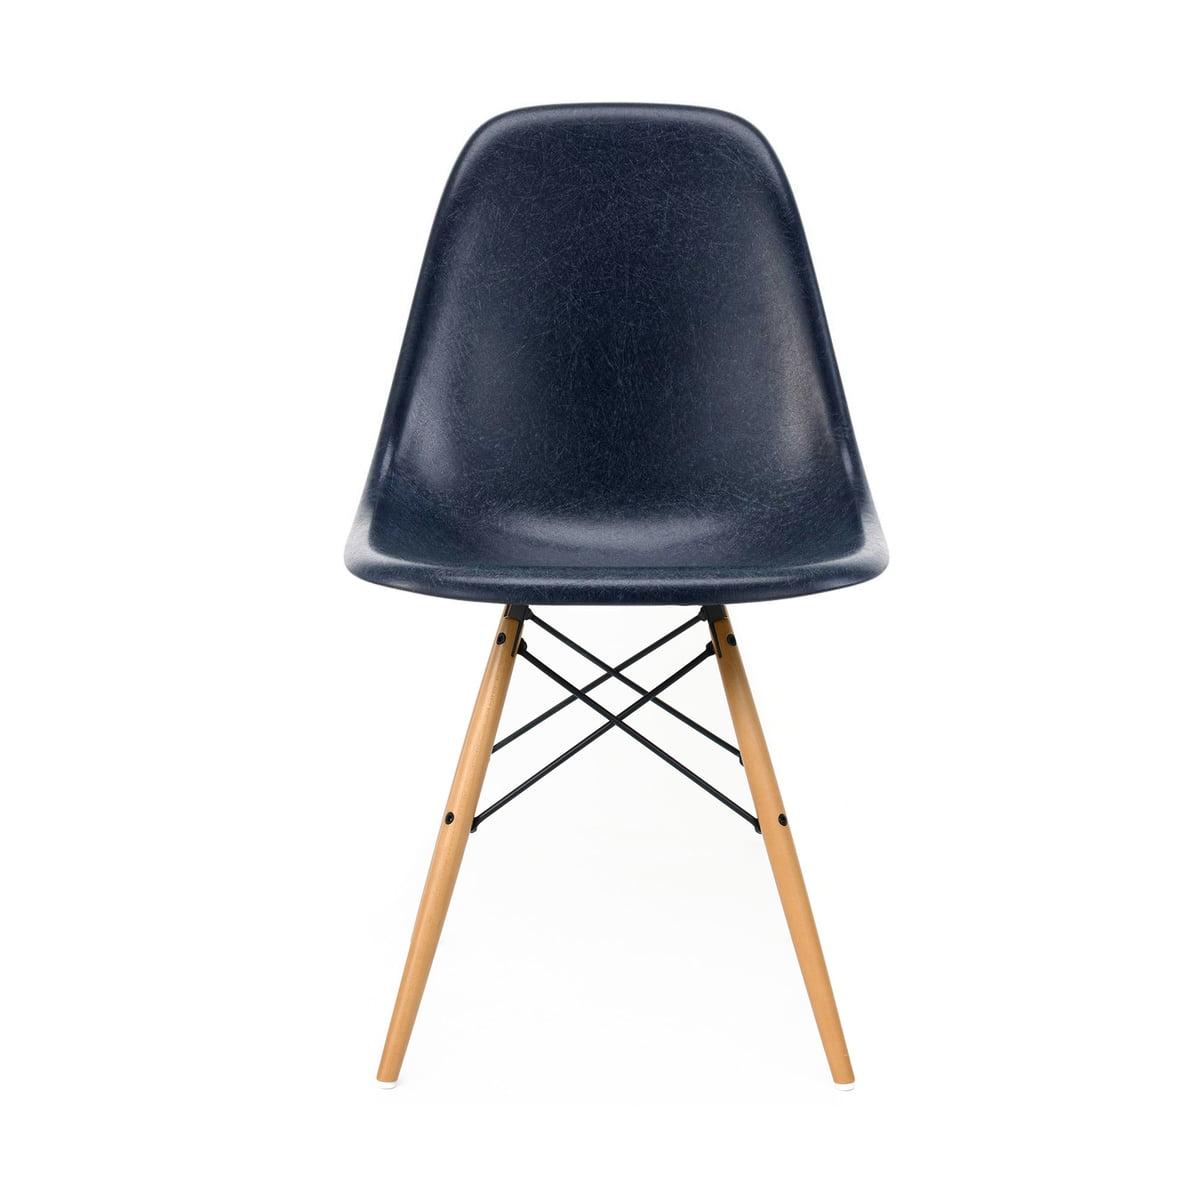 Gelblich Vitra Weiss Fiberglass Side DswAhorn Eames Chair Parchmentfilzgleiter cAjL354RqS